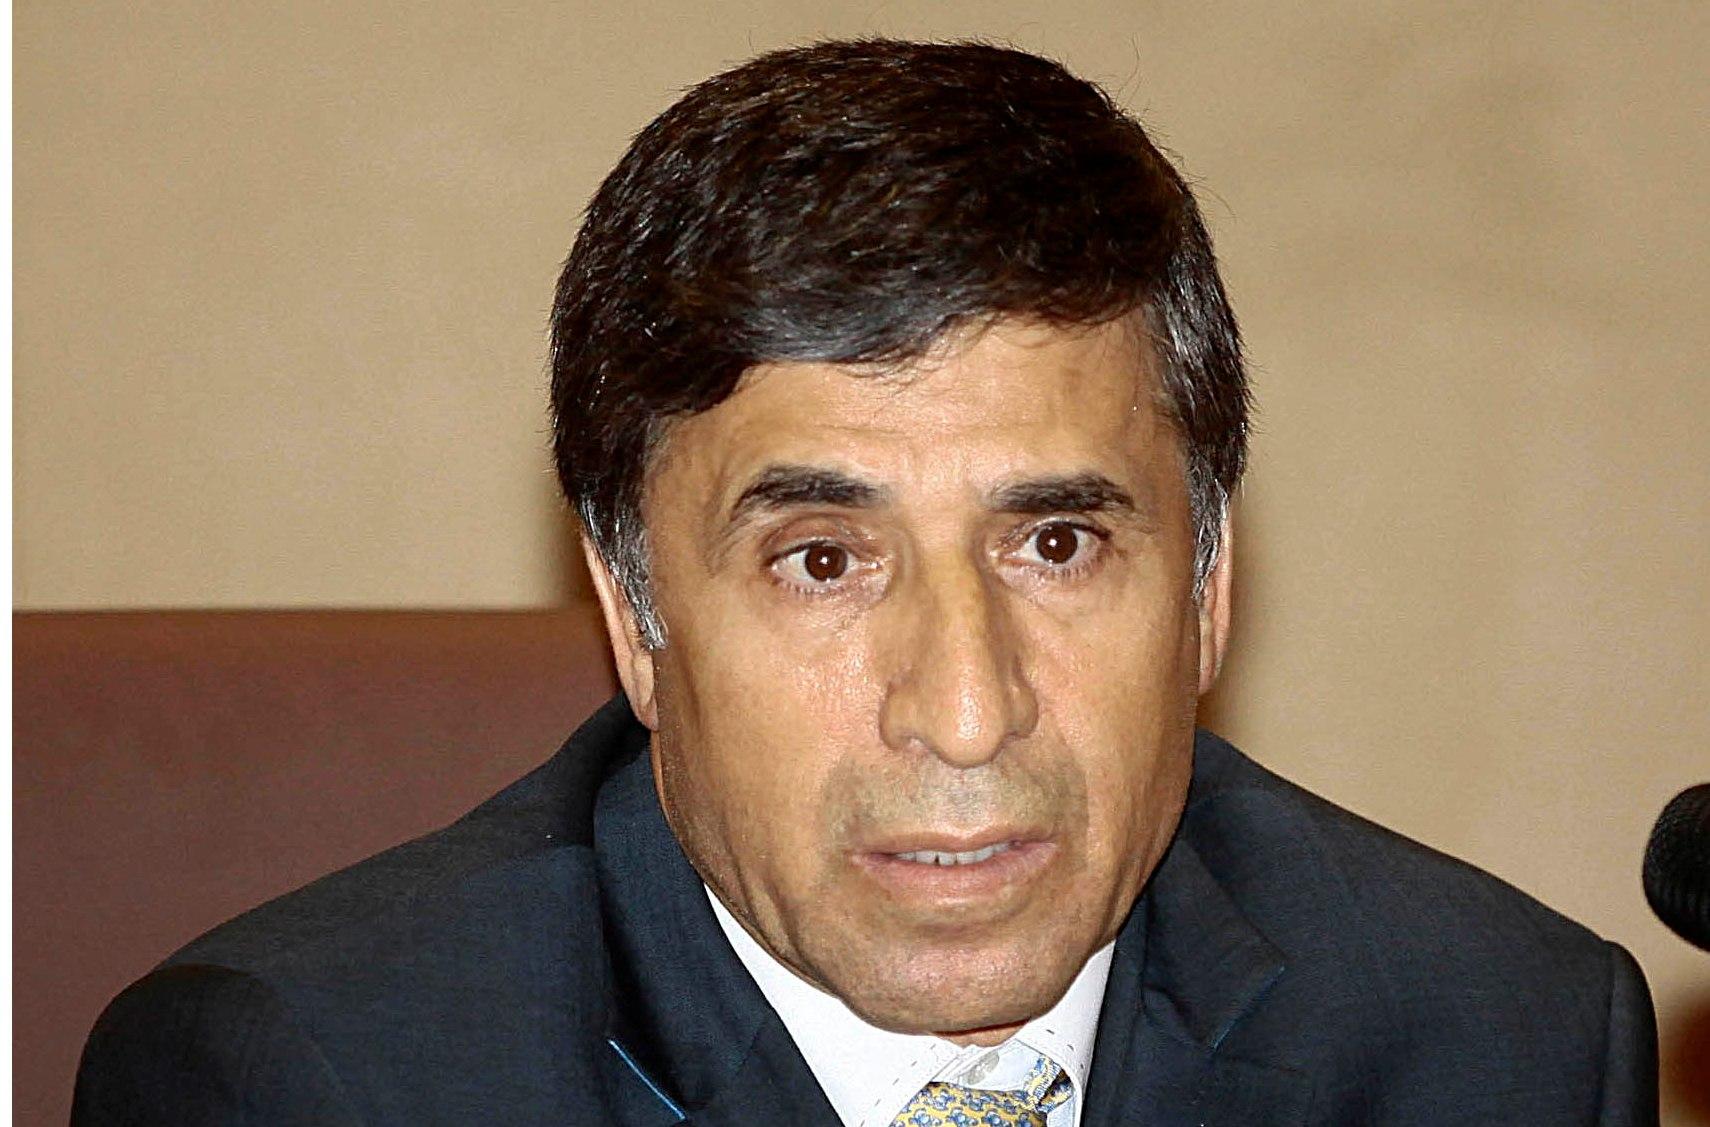 L'ambassadeur d'Alger à Washington, Majid Bouguerra.